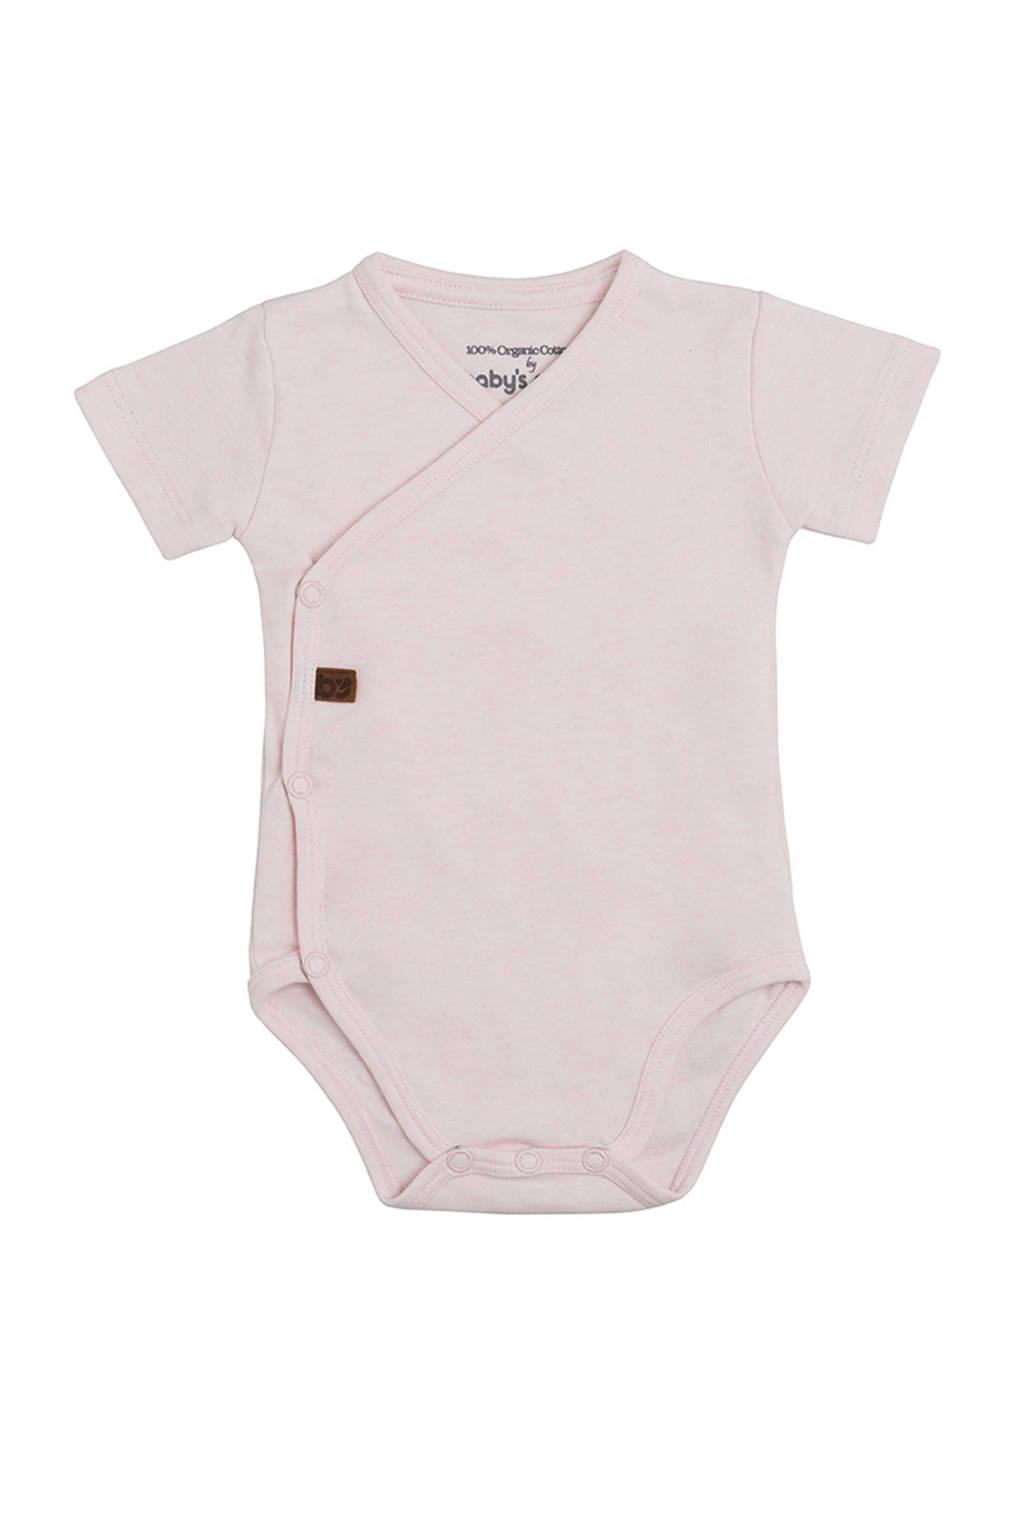 Baby's Only newborn baby romper, Roze